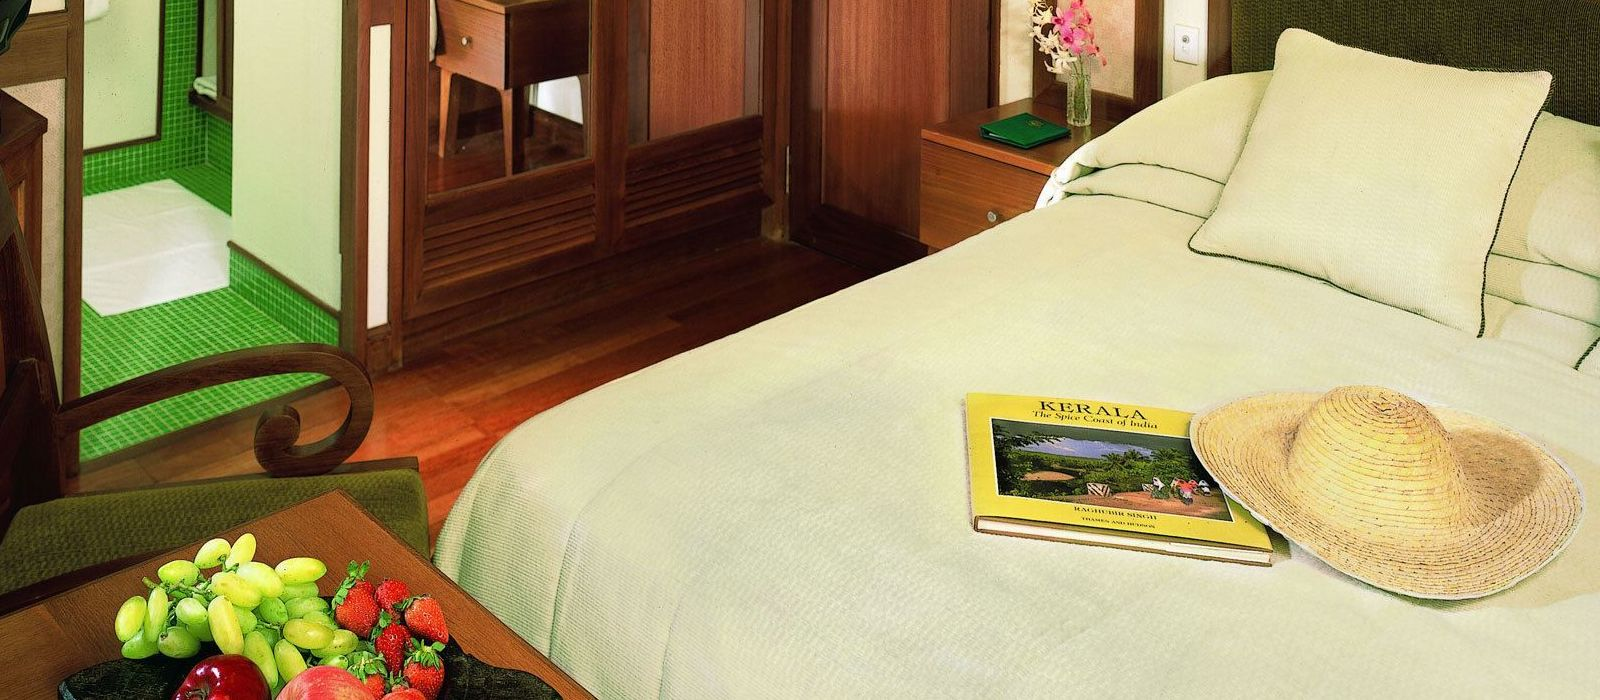 Hotel The Oberoi Motor Vessel Vrinda Südindien